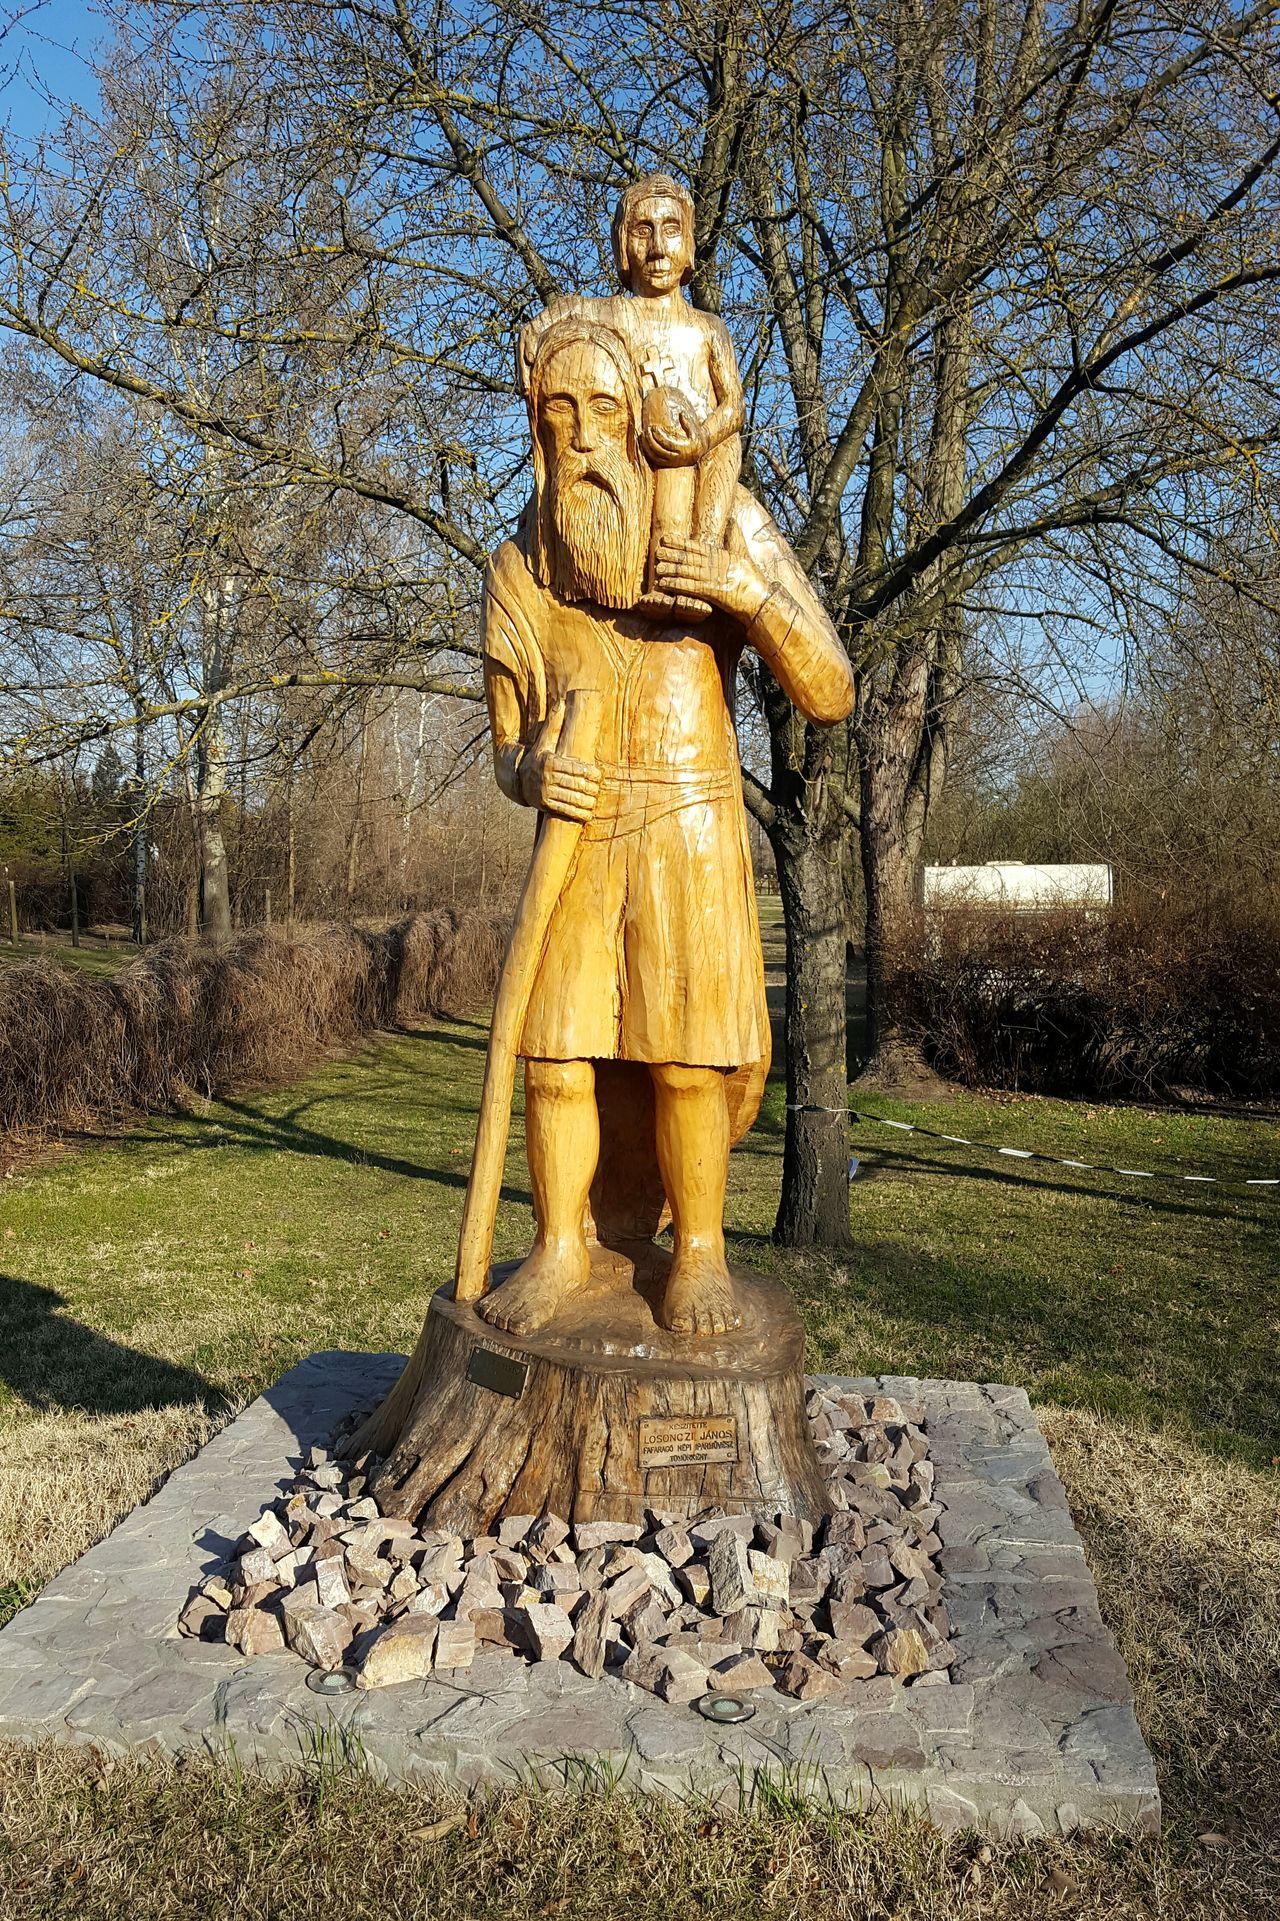 Credit to Losonczi János Woodcarver Folk Handicrafts Human Representation Kiskunmajsa Camping Statue Tree Sculpture Outdoors No People Sunlight